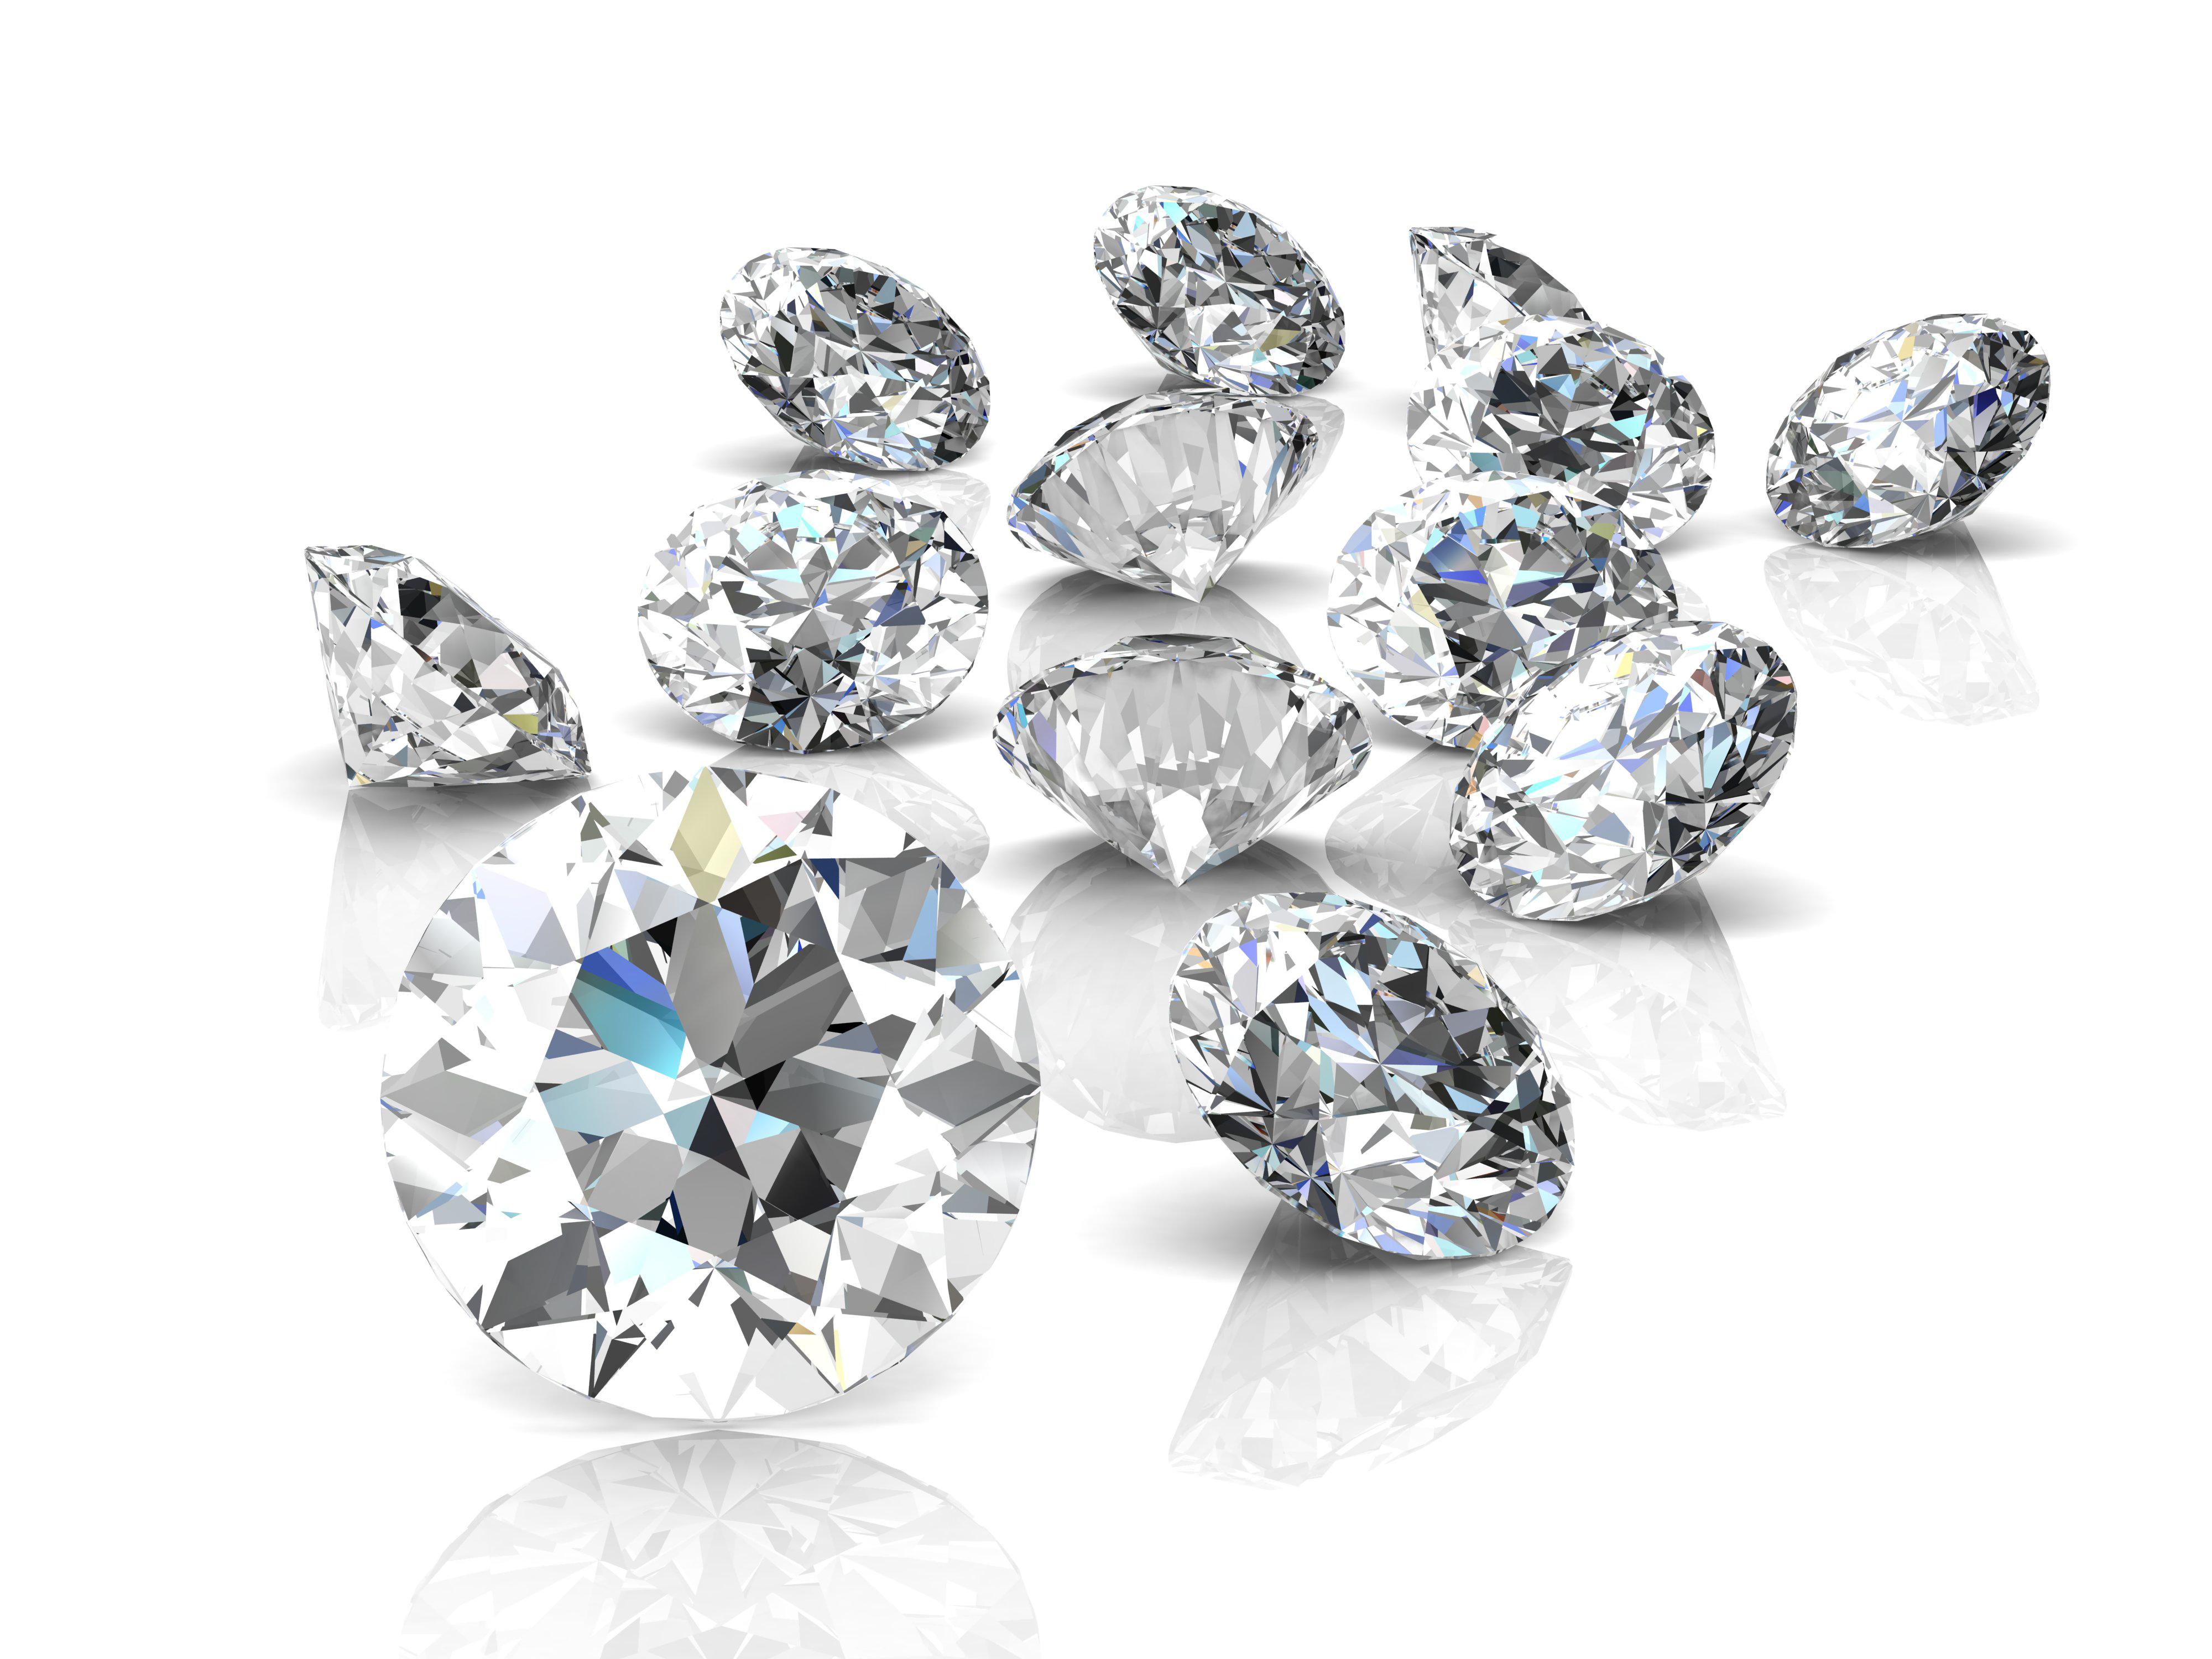 buy Loose Diamonds Wholesale